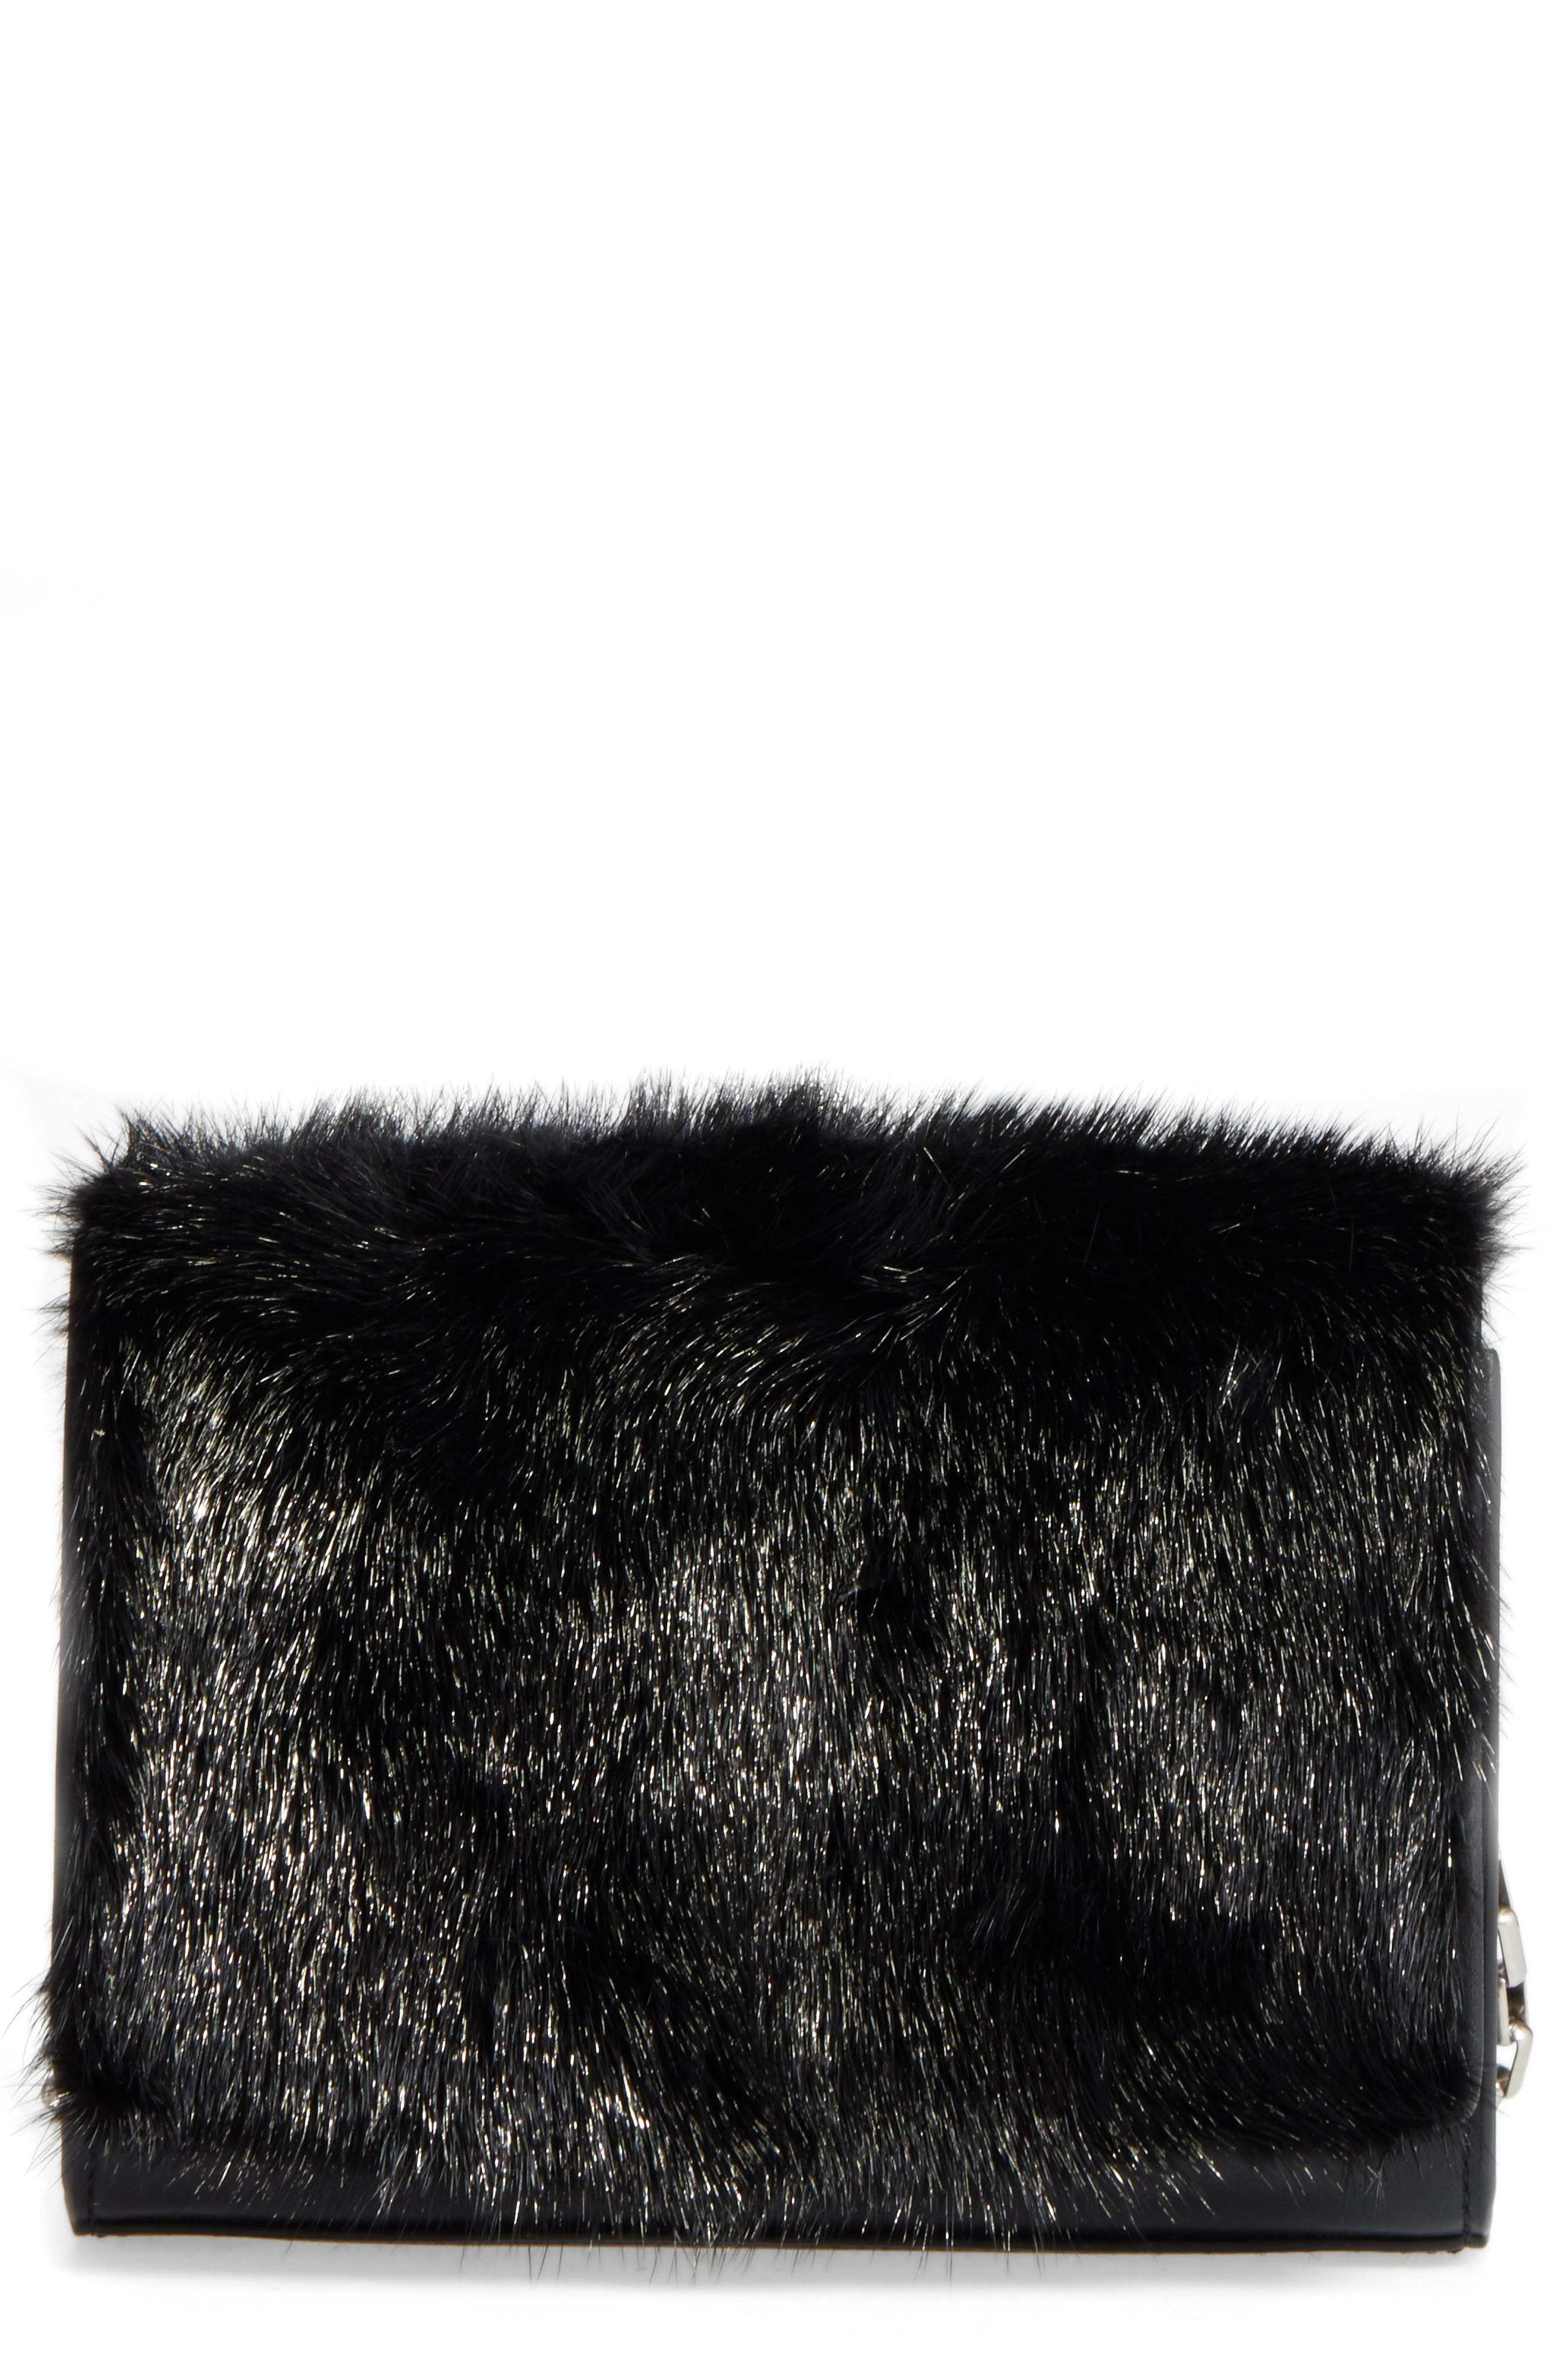 Yasmin Genuine Mink Fur Clutch,                             Main thumbnail 1, color,                             Black